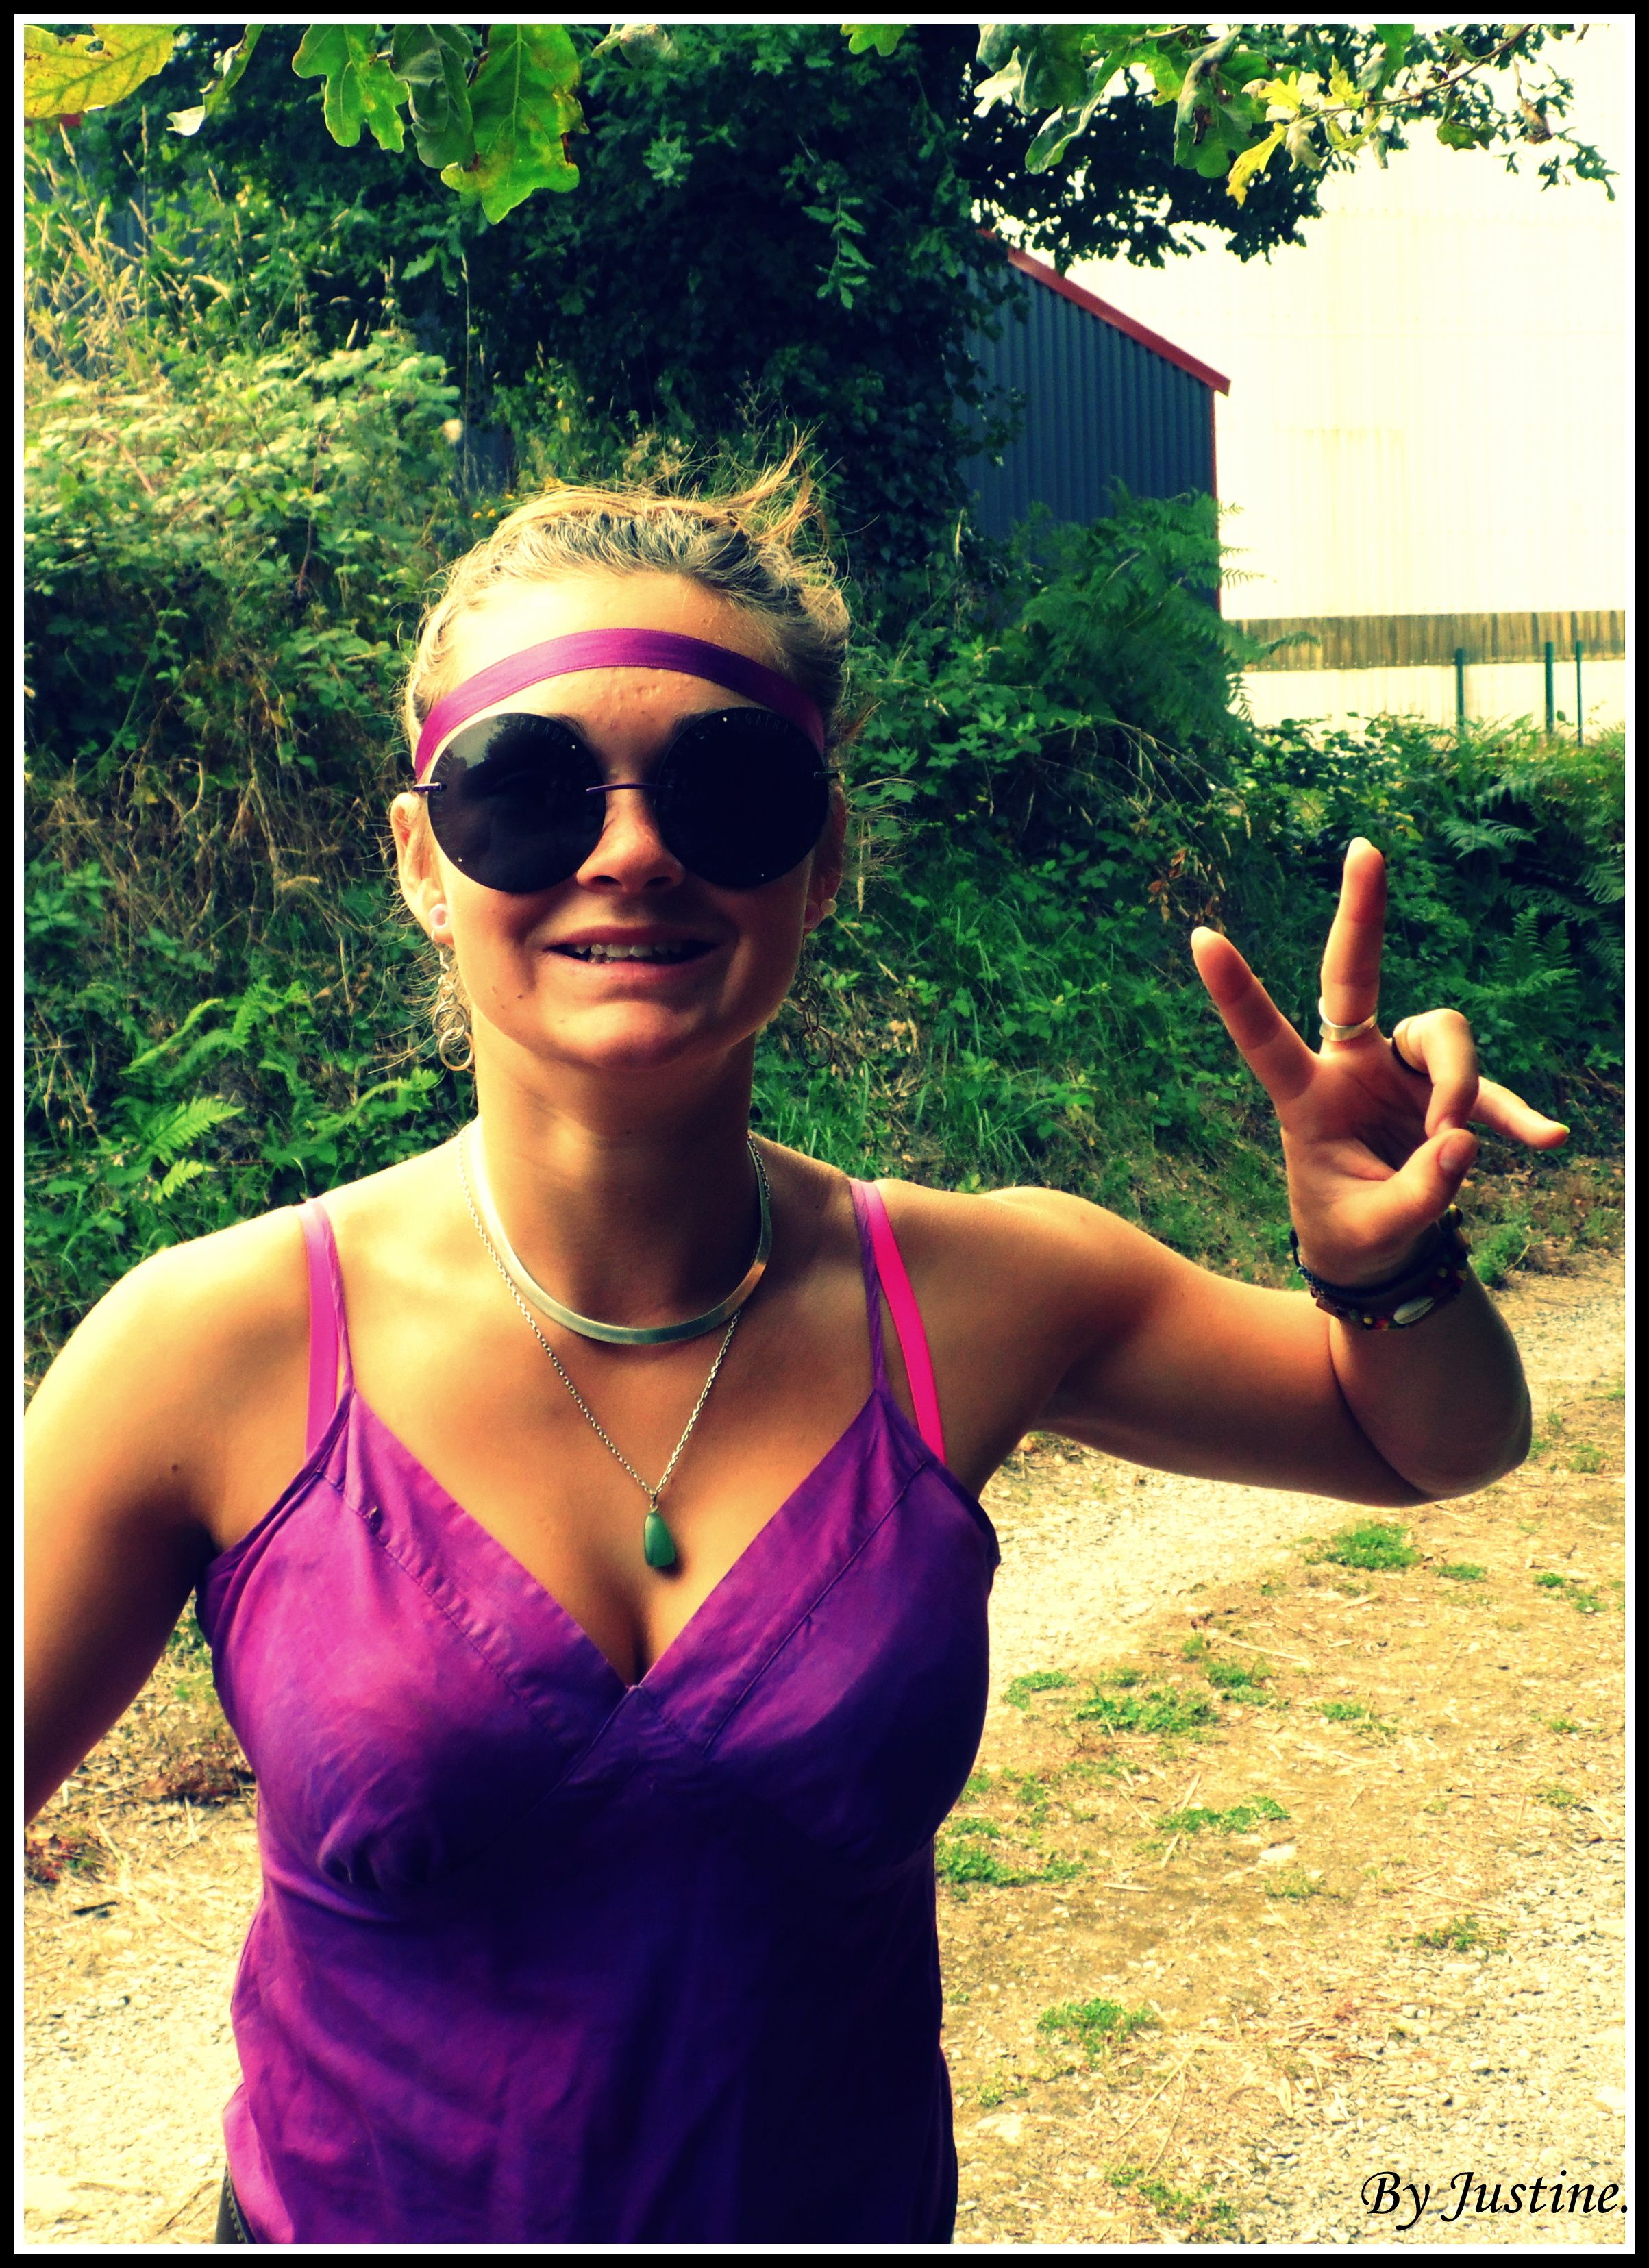 Hippie - Fun